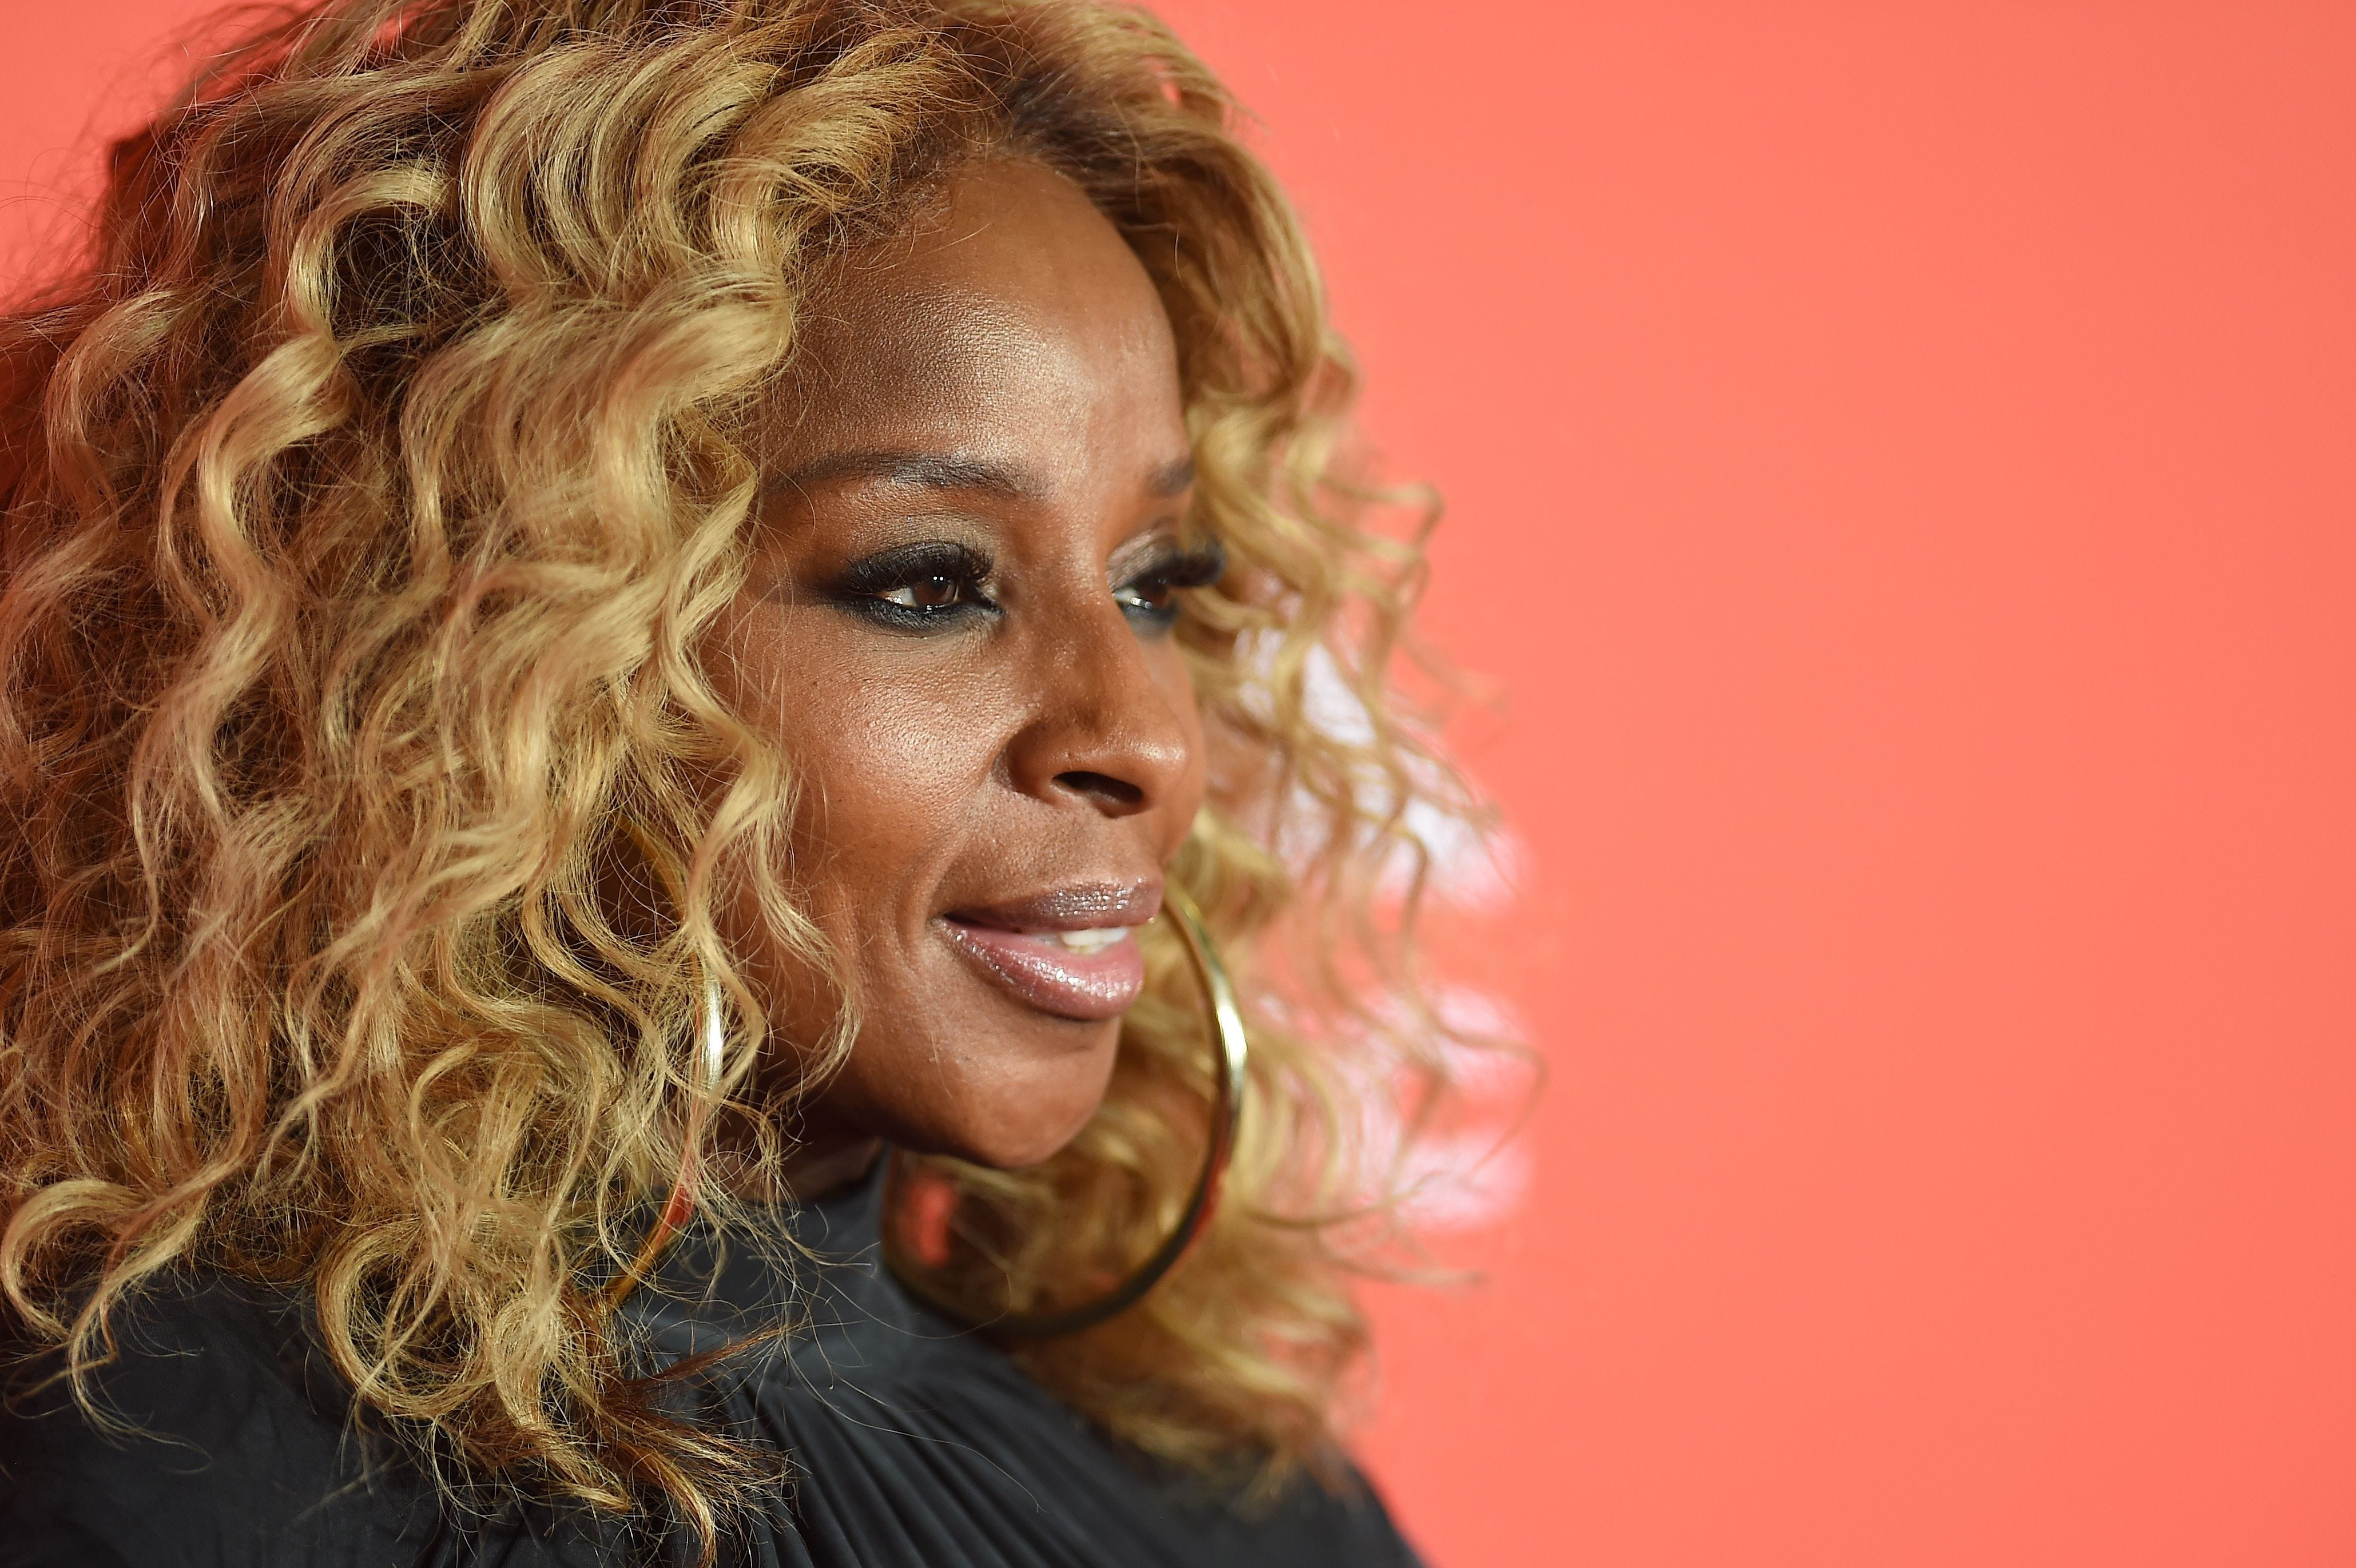 Concert announcements for Phoenix: Mary J. Blige, Nas, Jackie Evancho, Rascal Flatts, Wayne Newton